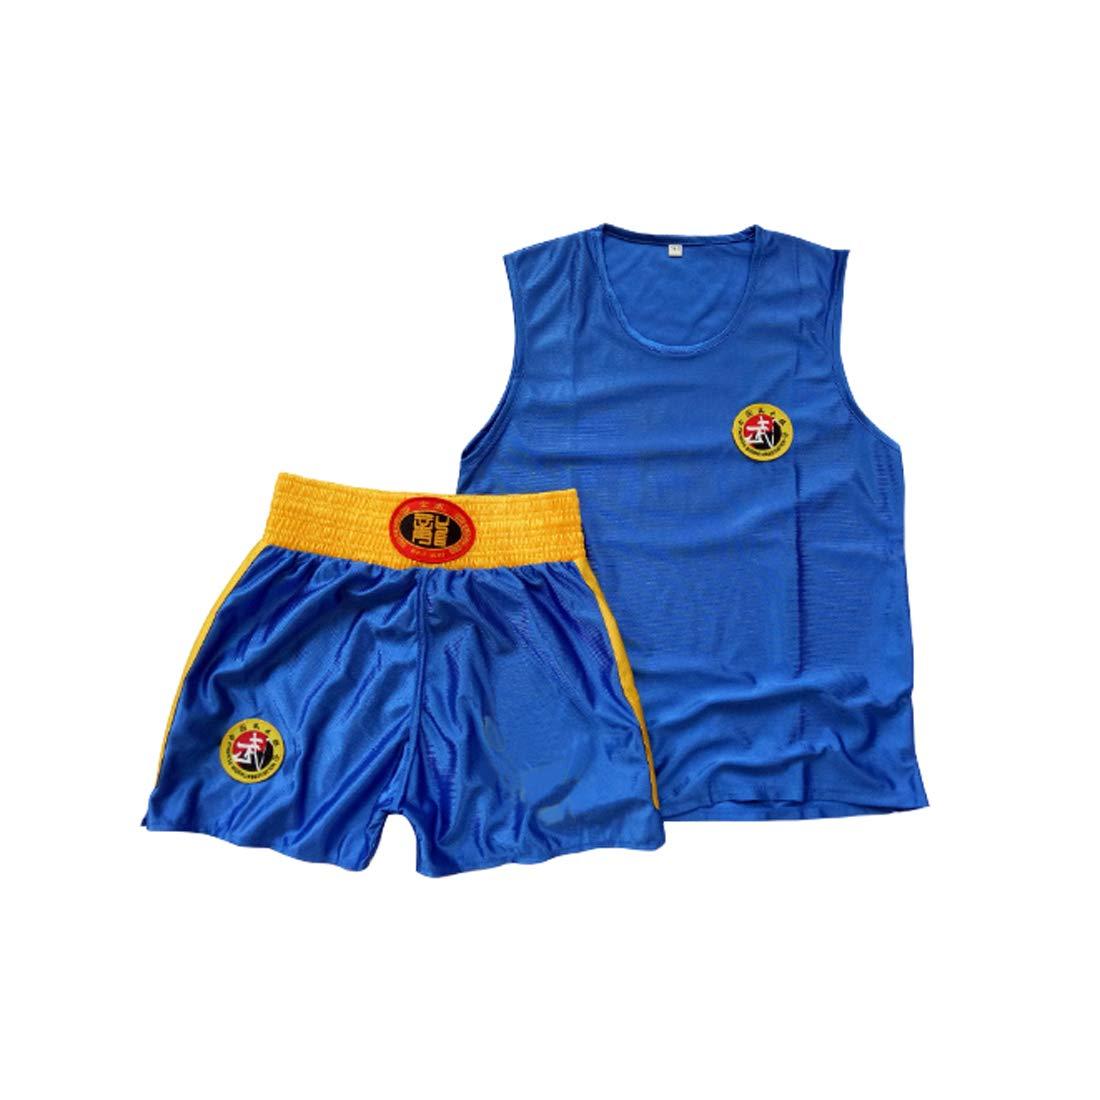 Inlefen Childrens Sanda Clothing Boys and Girls Adult Boxing Set Boxing Shorts Muay Thai Clothing Martial Arts Training Wear Sportswear